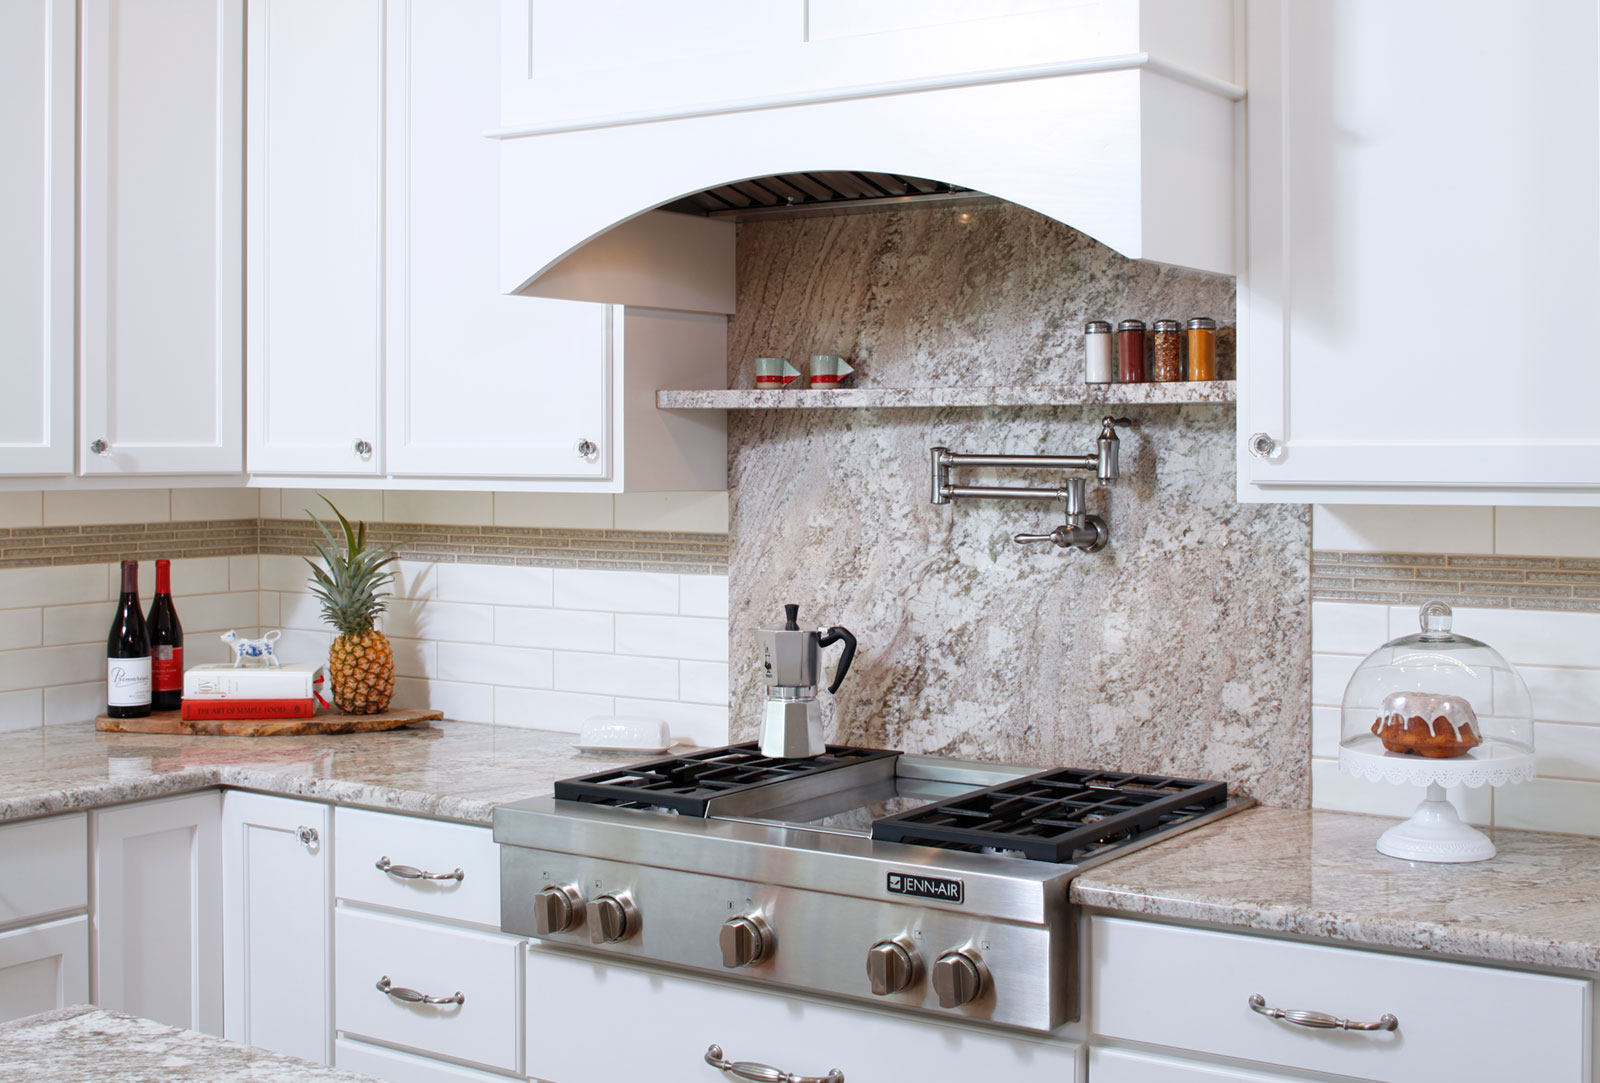 historic home remodel and addition - Henderer Design + Build, Corvallis OR